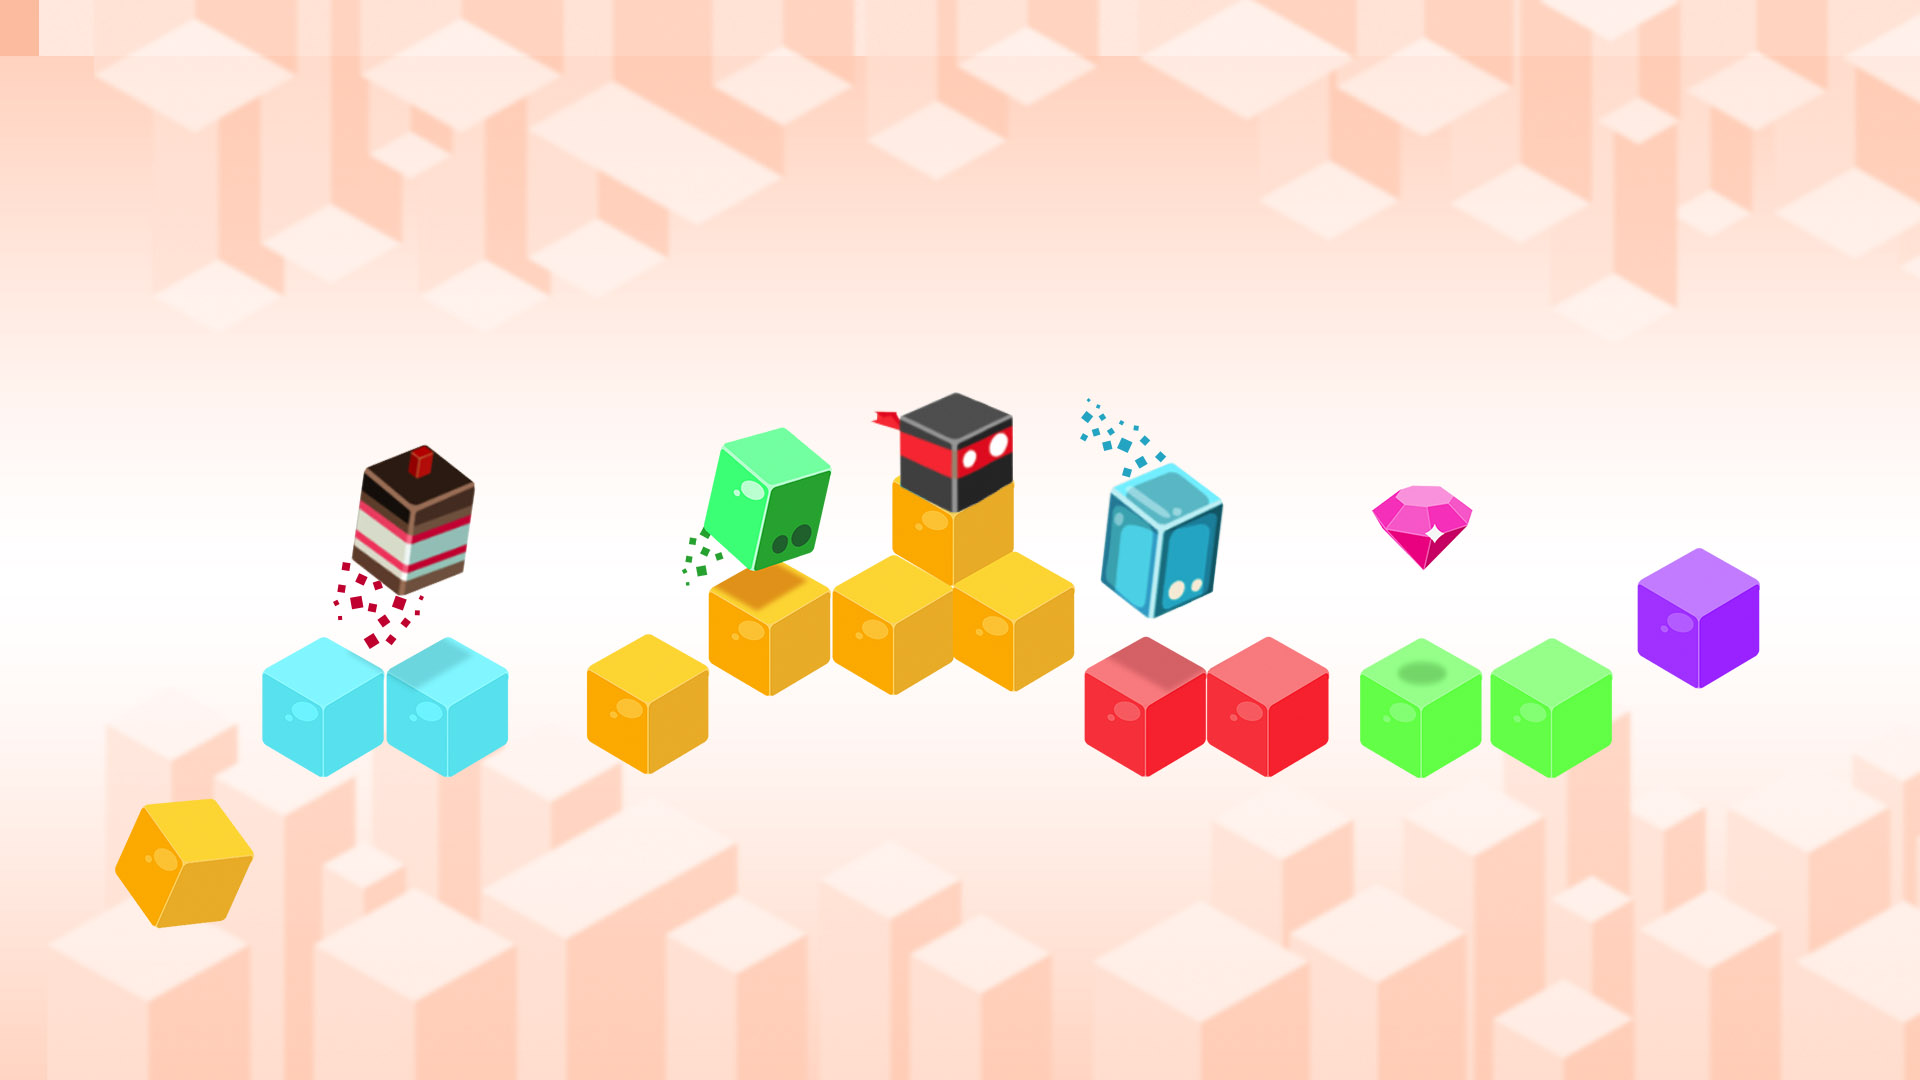 Bouncing Square screenshot 11